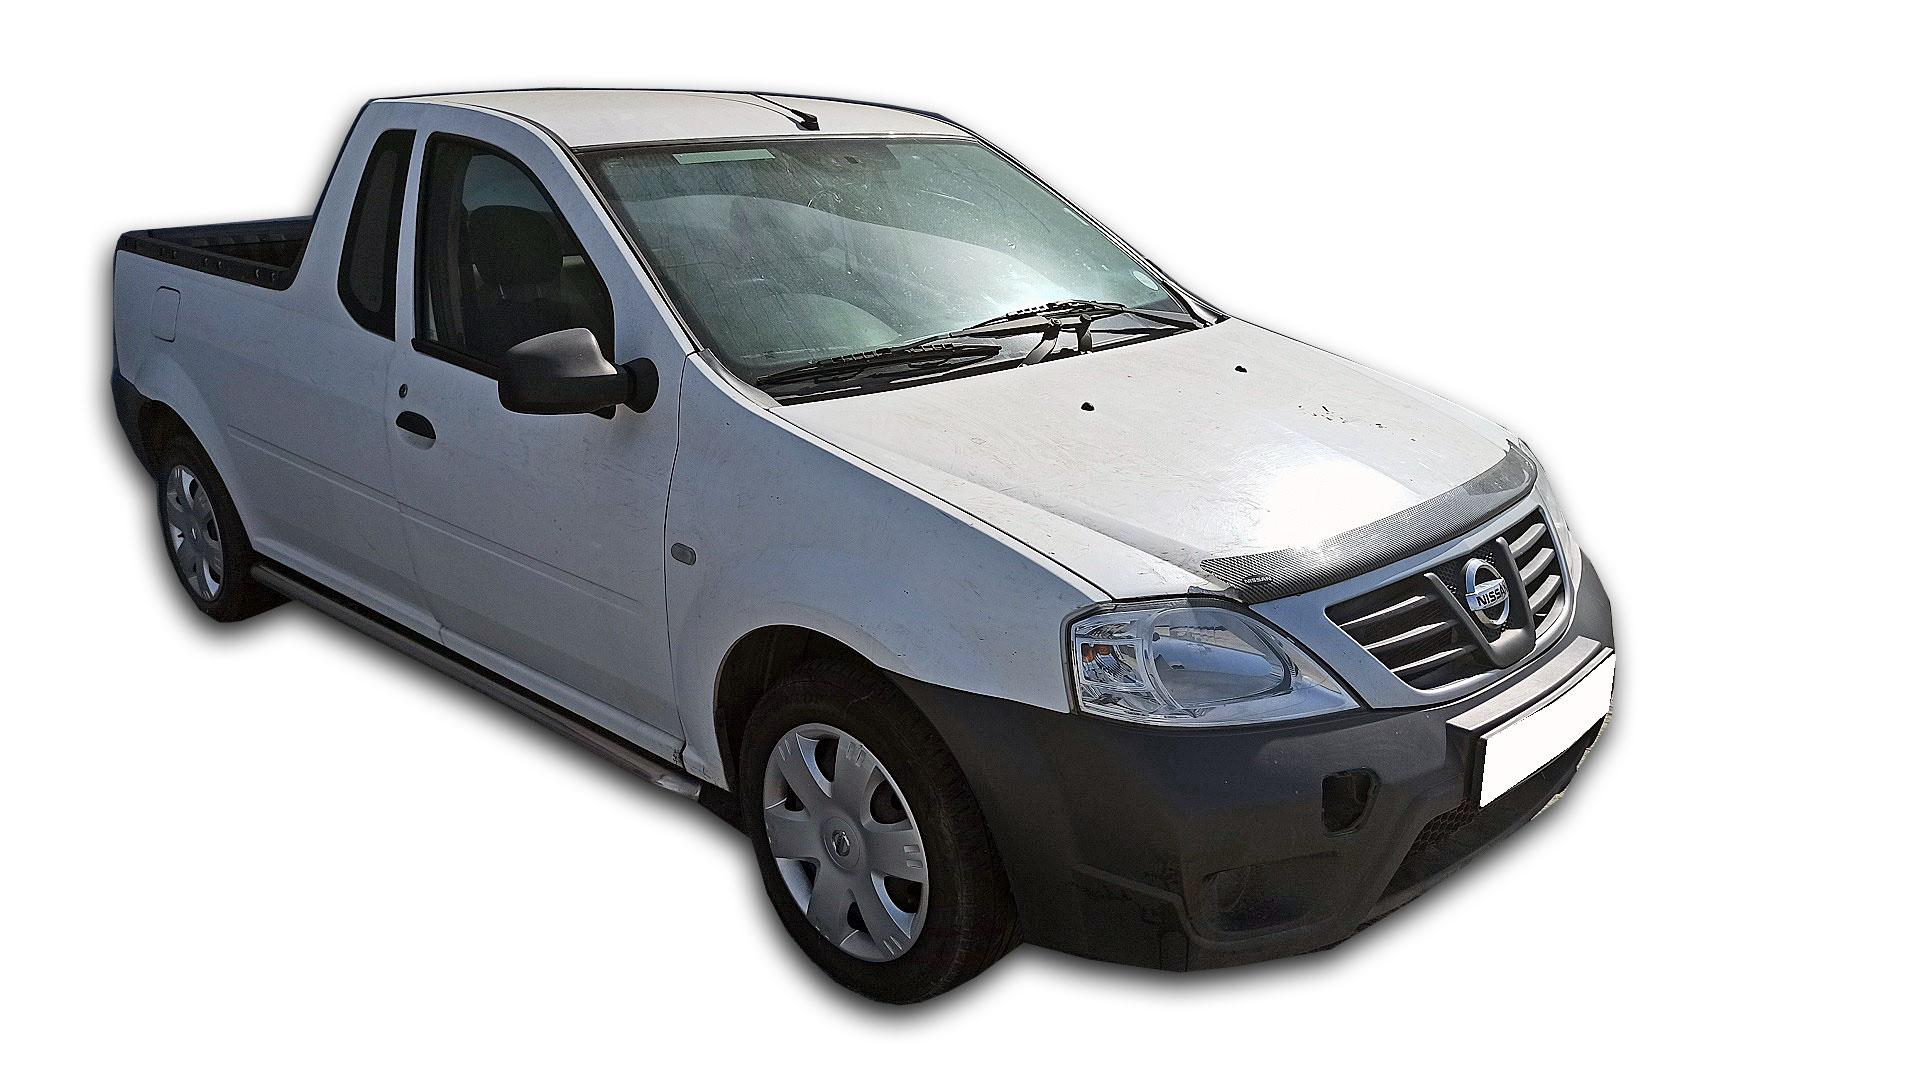 Nissan NP200 1.5 Dci  A/C Safe